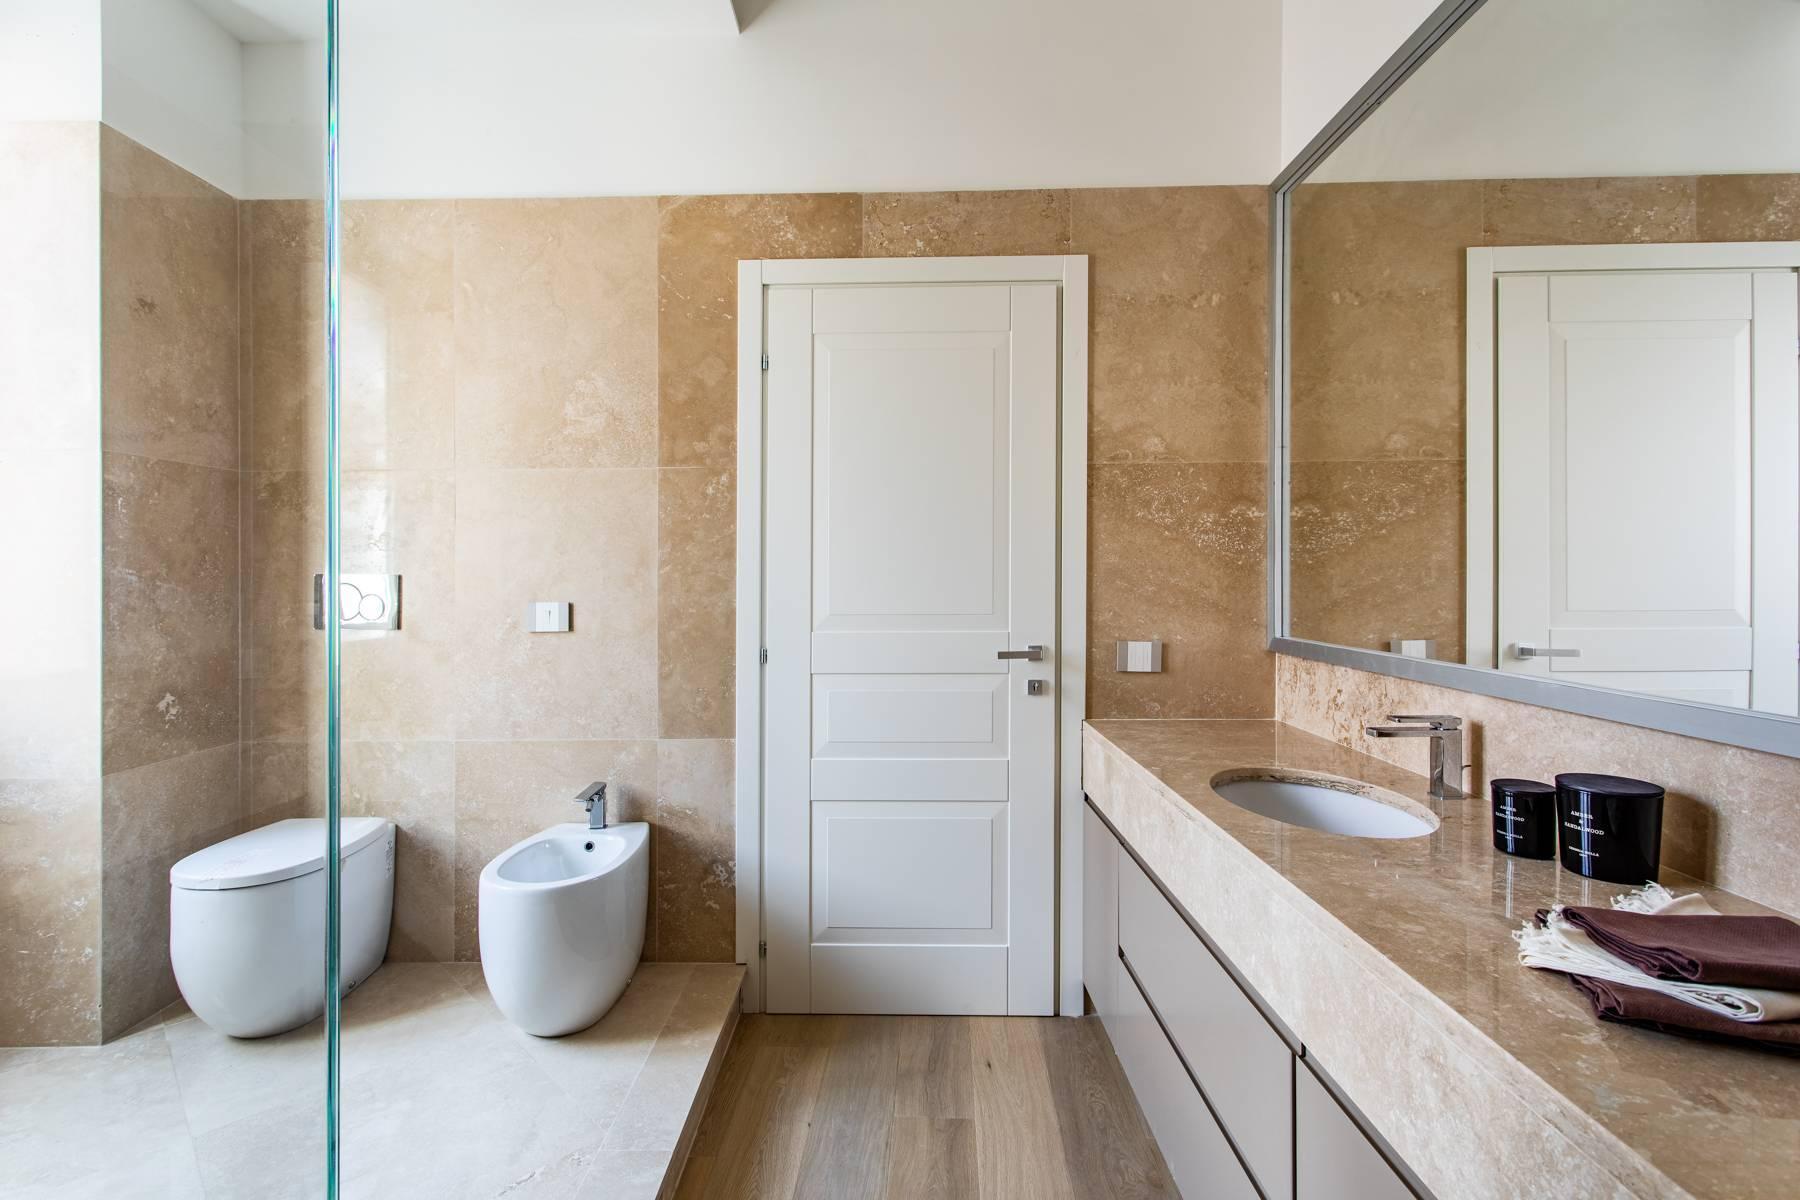 Spanish Steps luxury turnkey apartment - 10